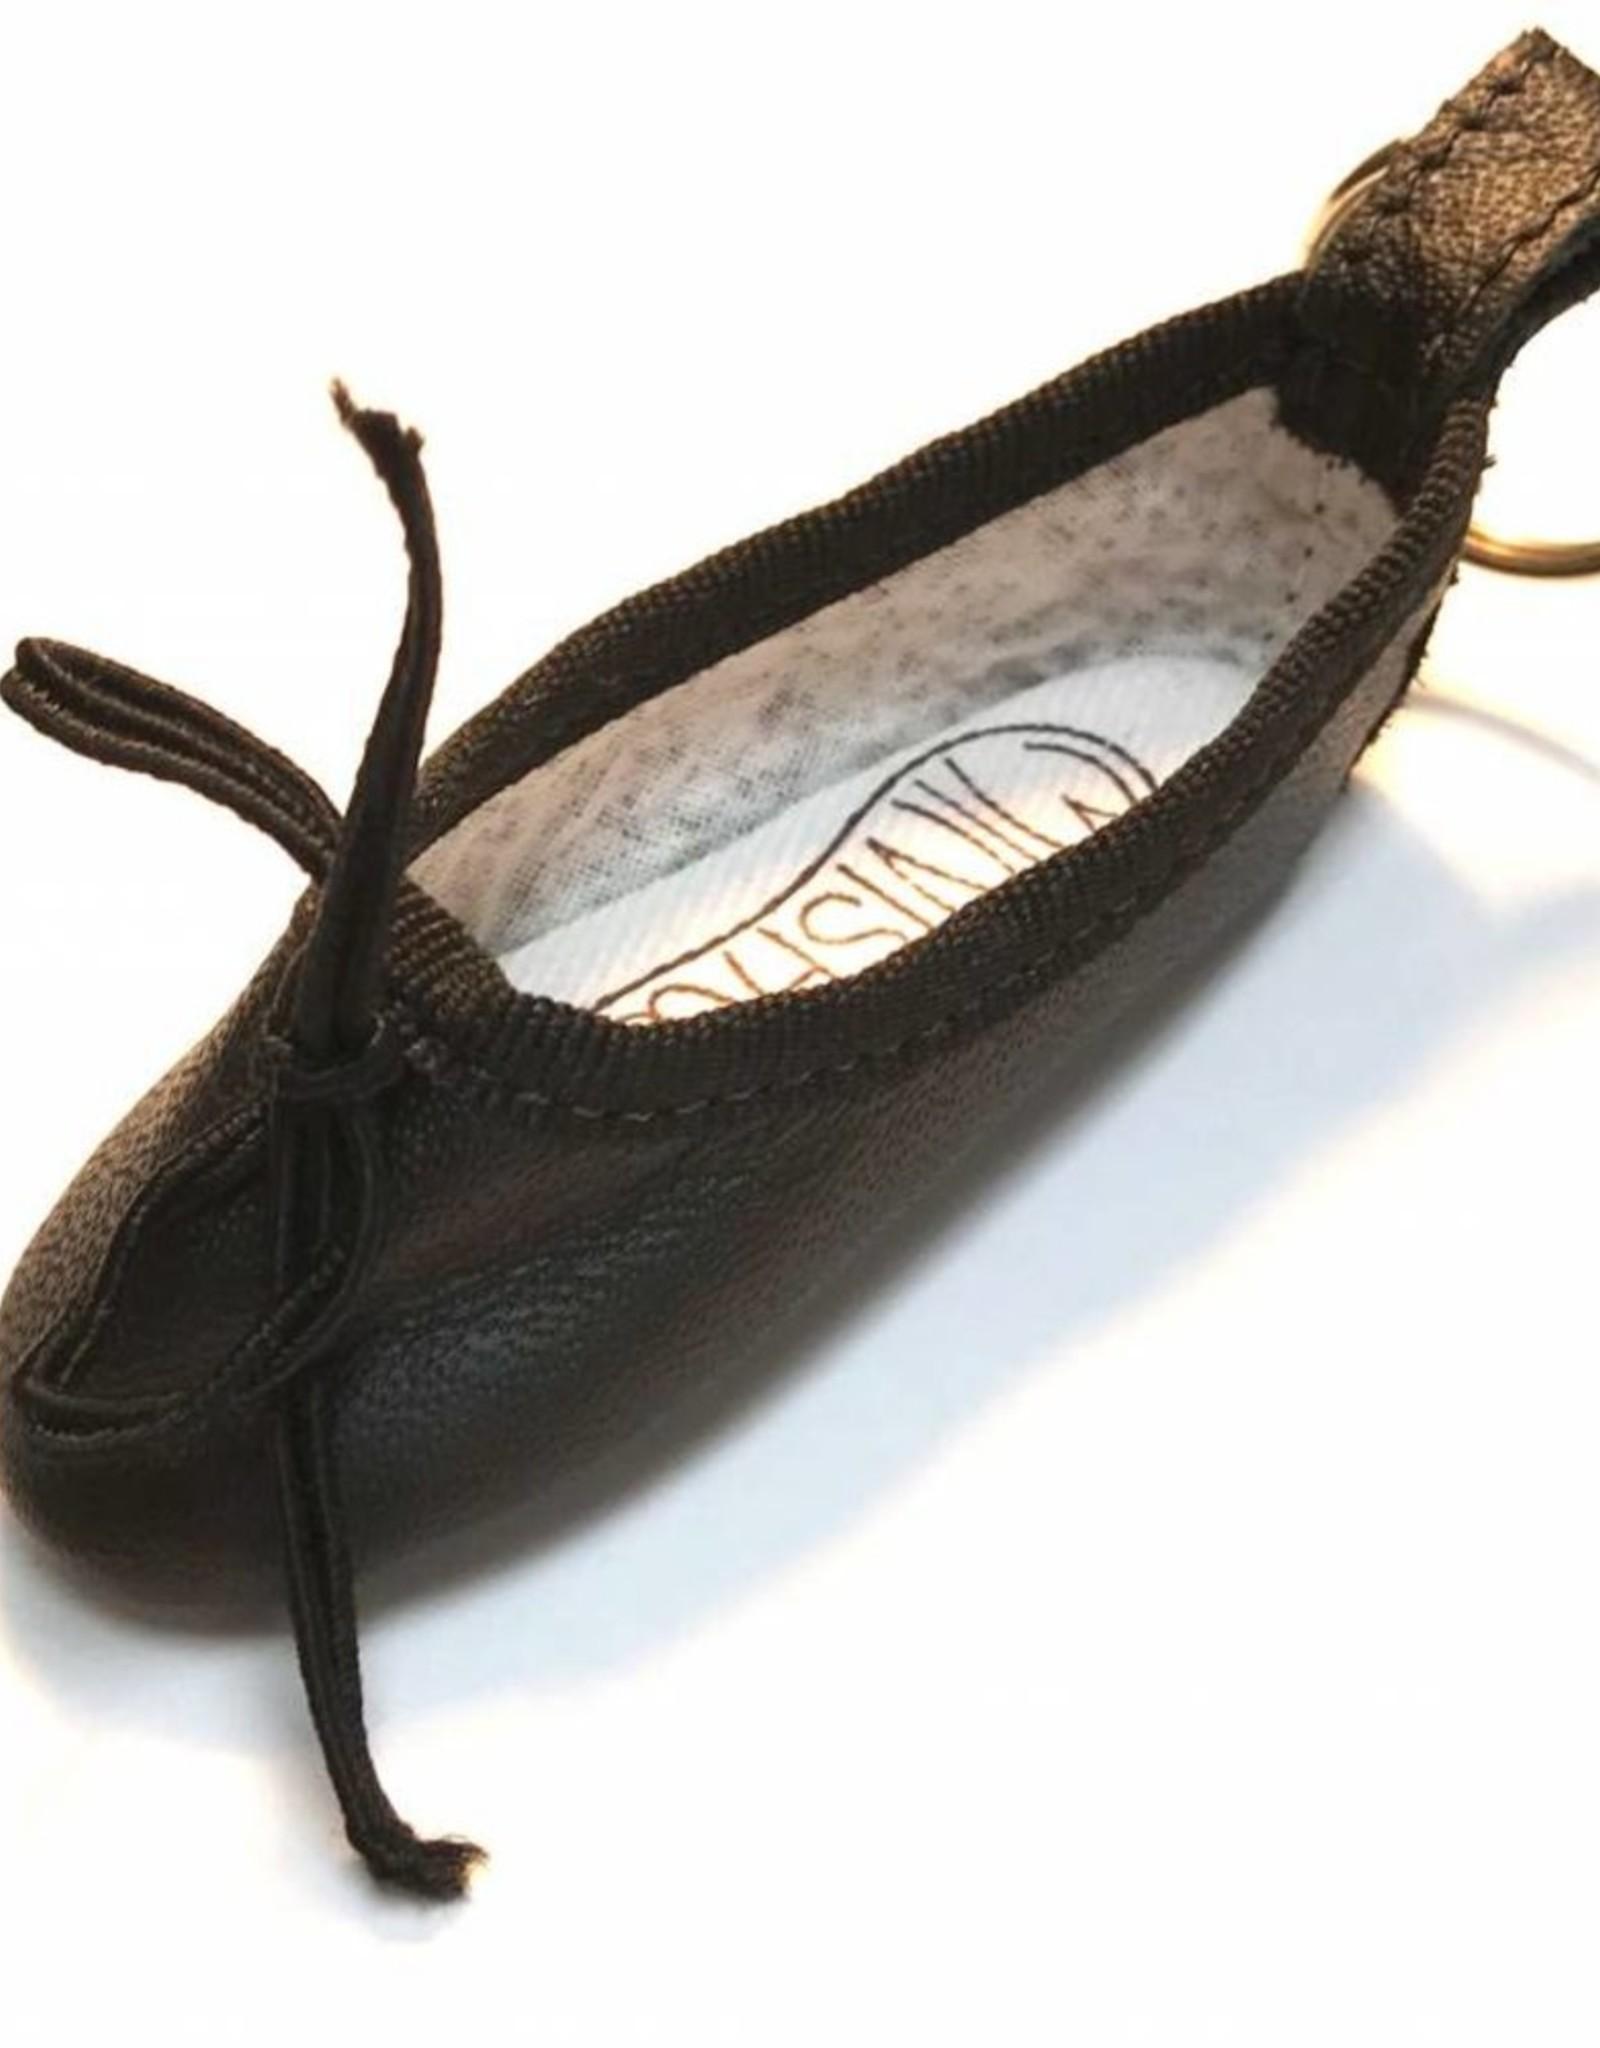 Pillows for Pointes Pillows for Pointe MiniShooz Ballet Slipper Key Ring